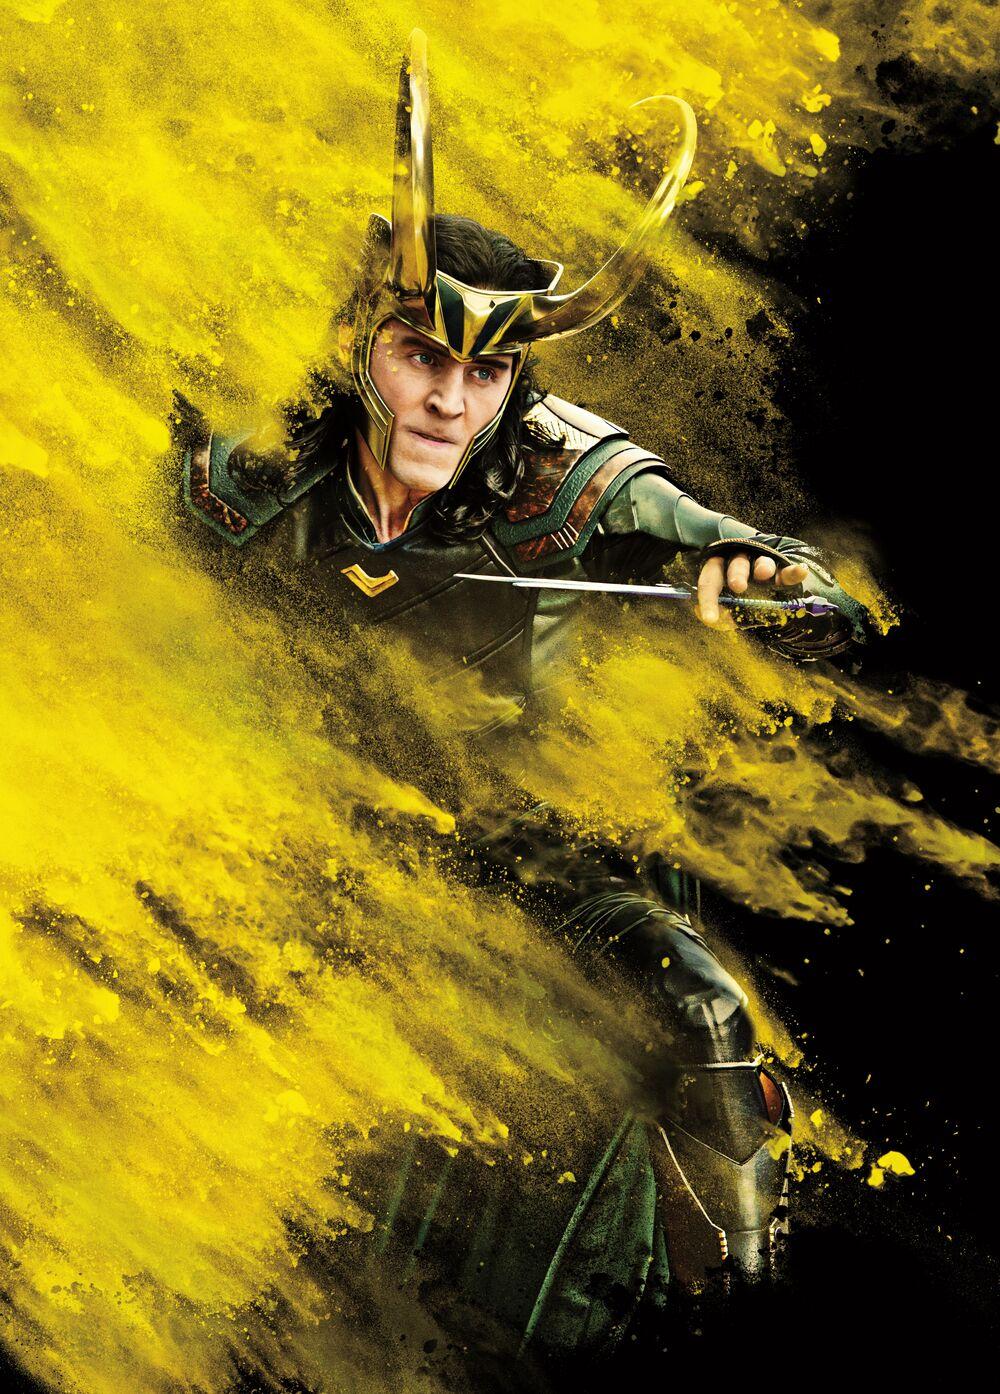 MBTI enneagram type of Loki